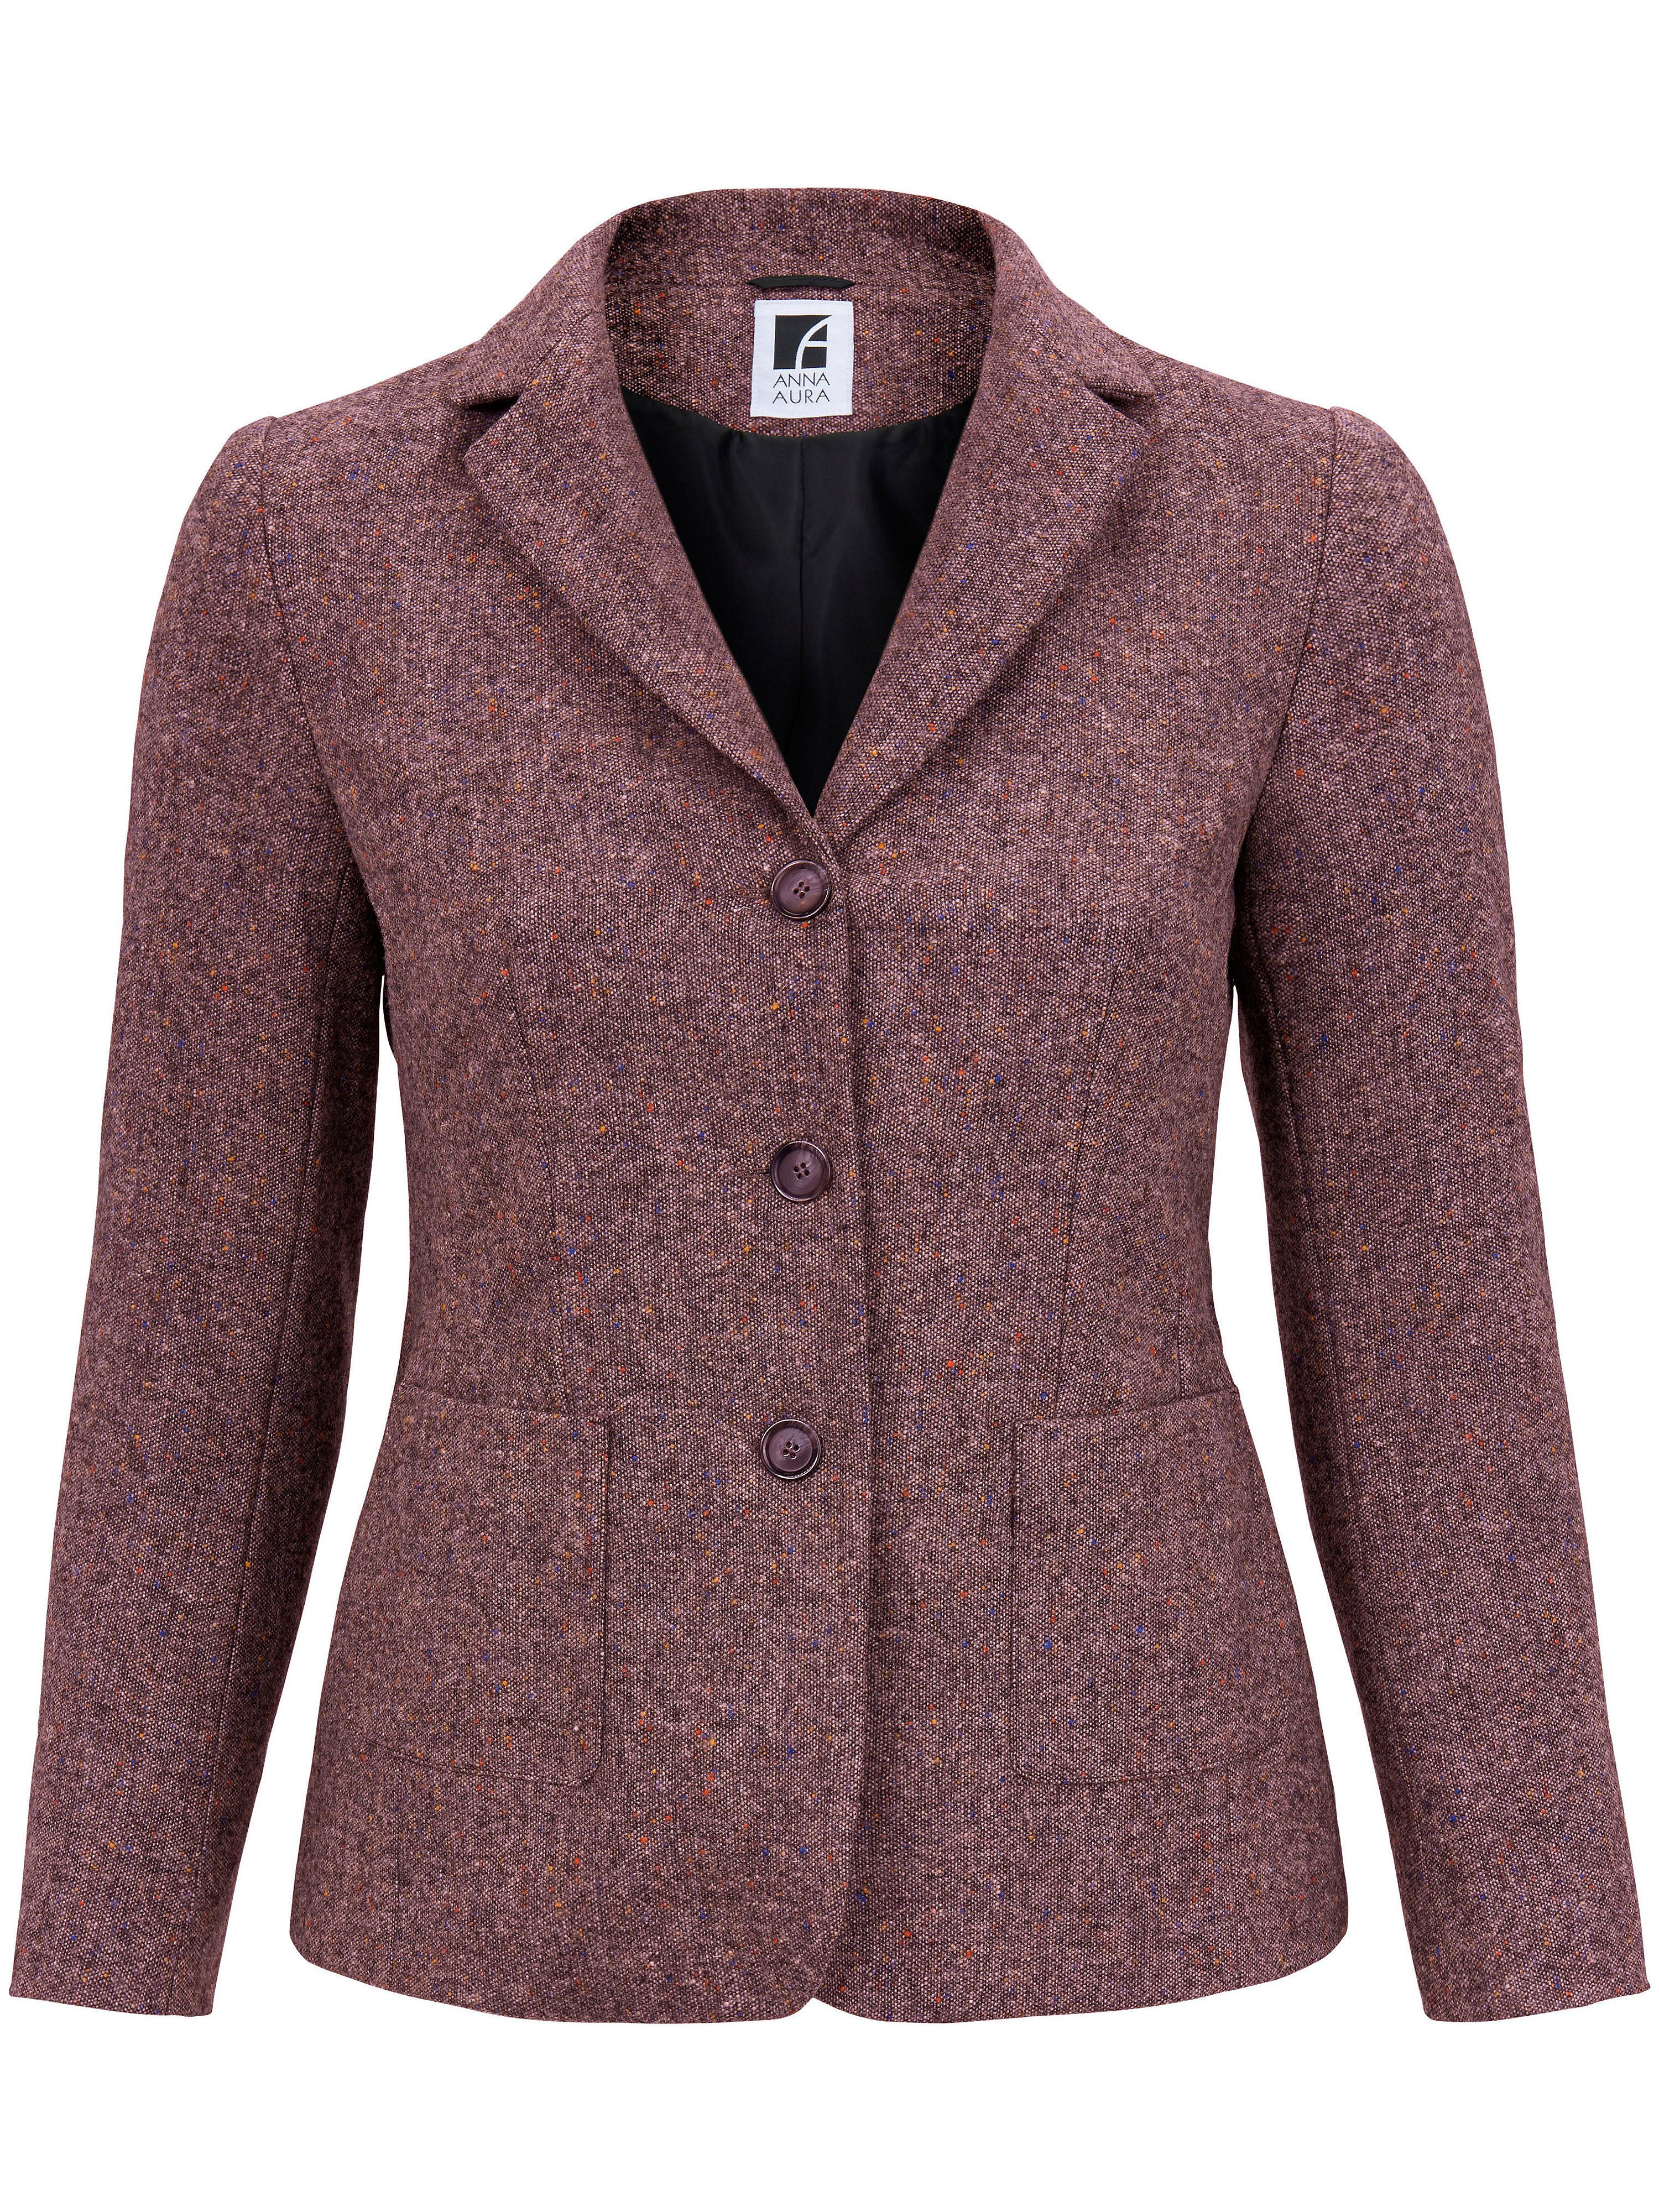 Image of   Blazer i 100% ren ny uld Fra Anna Aura pink